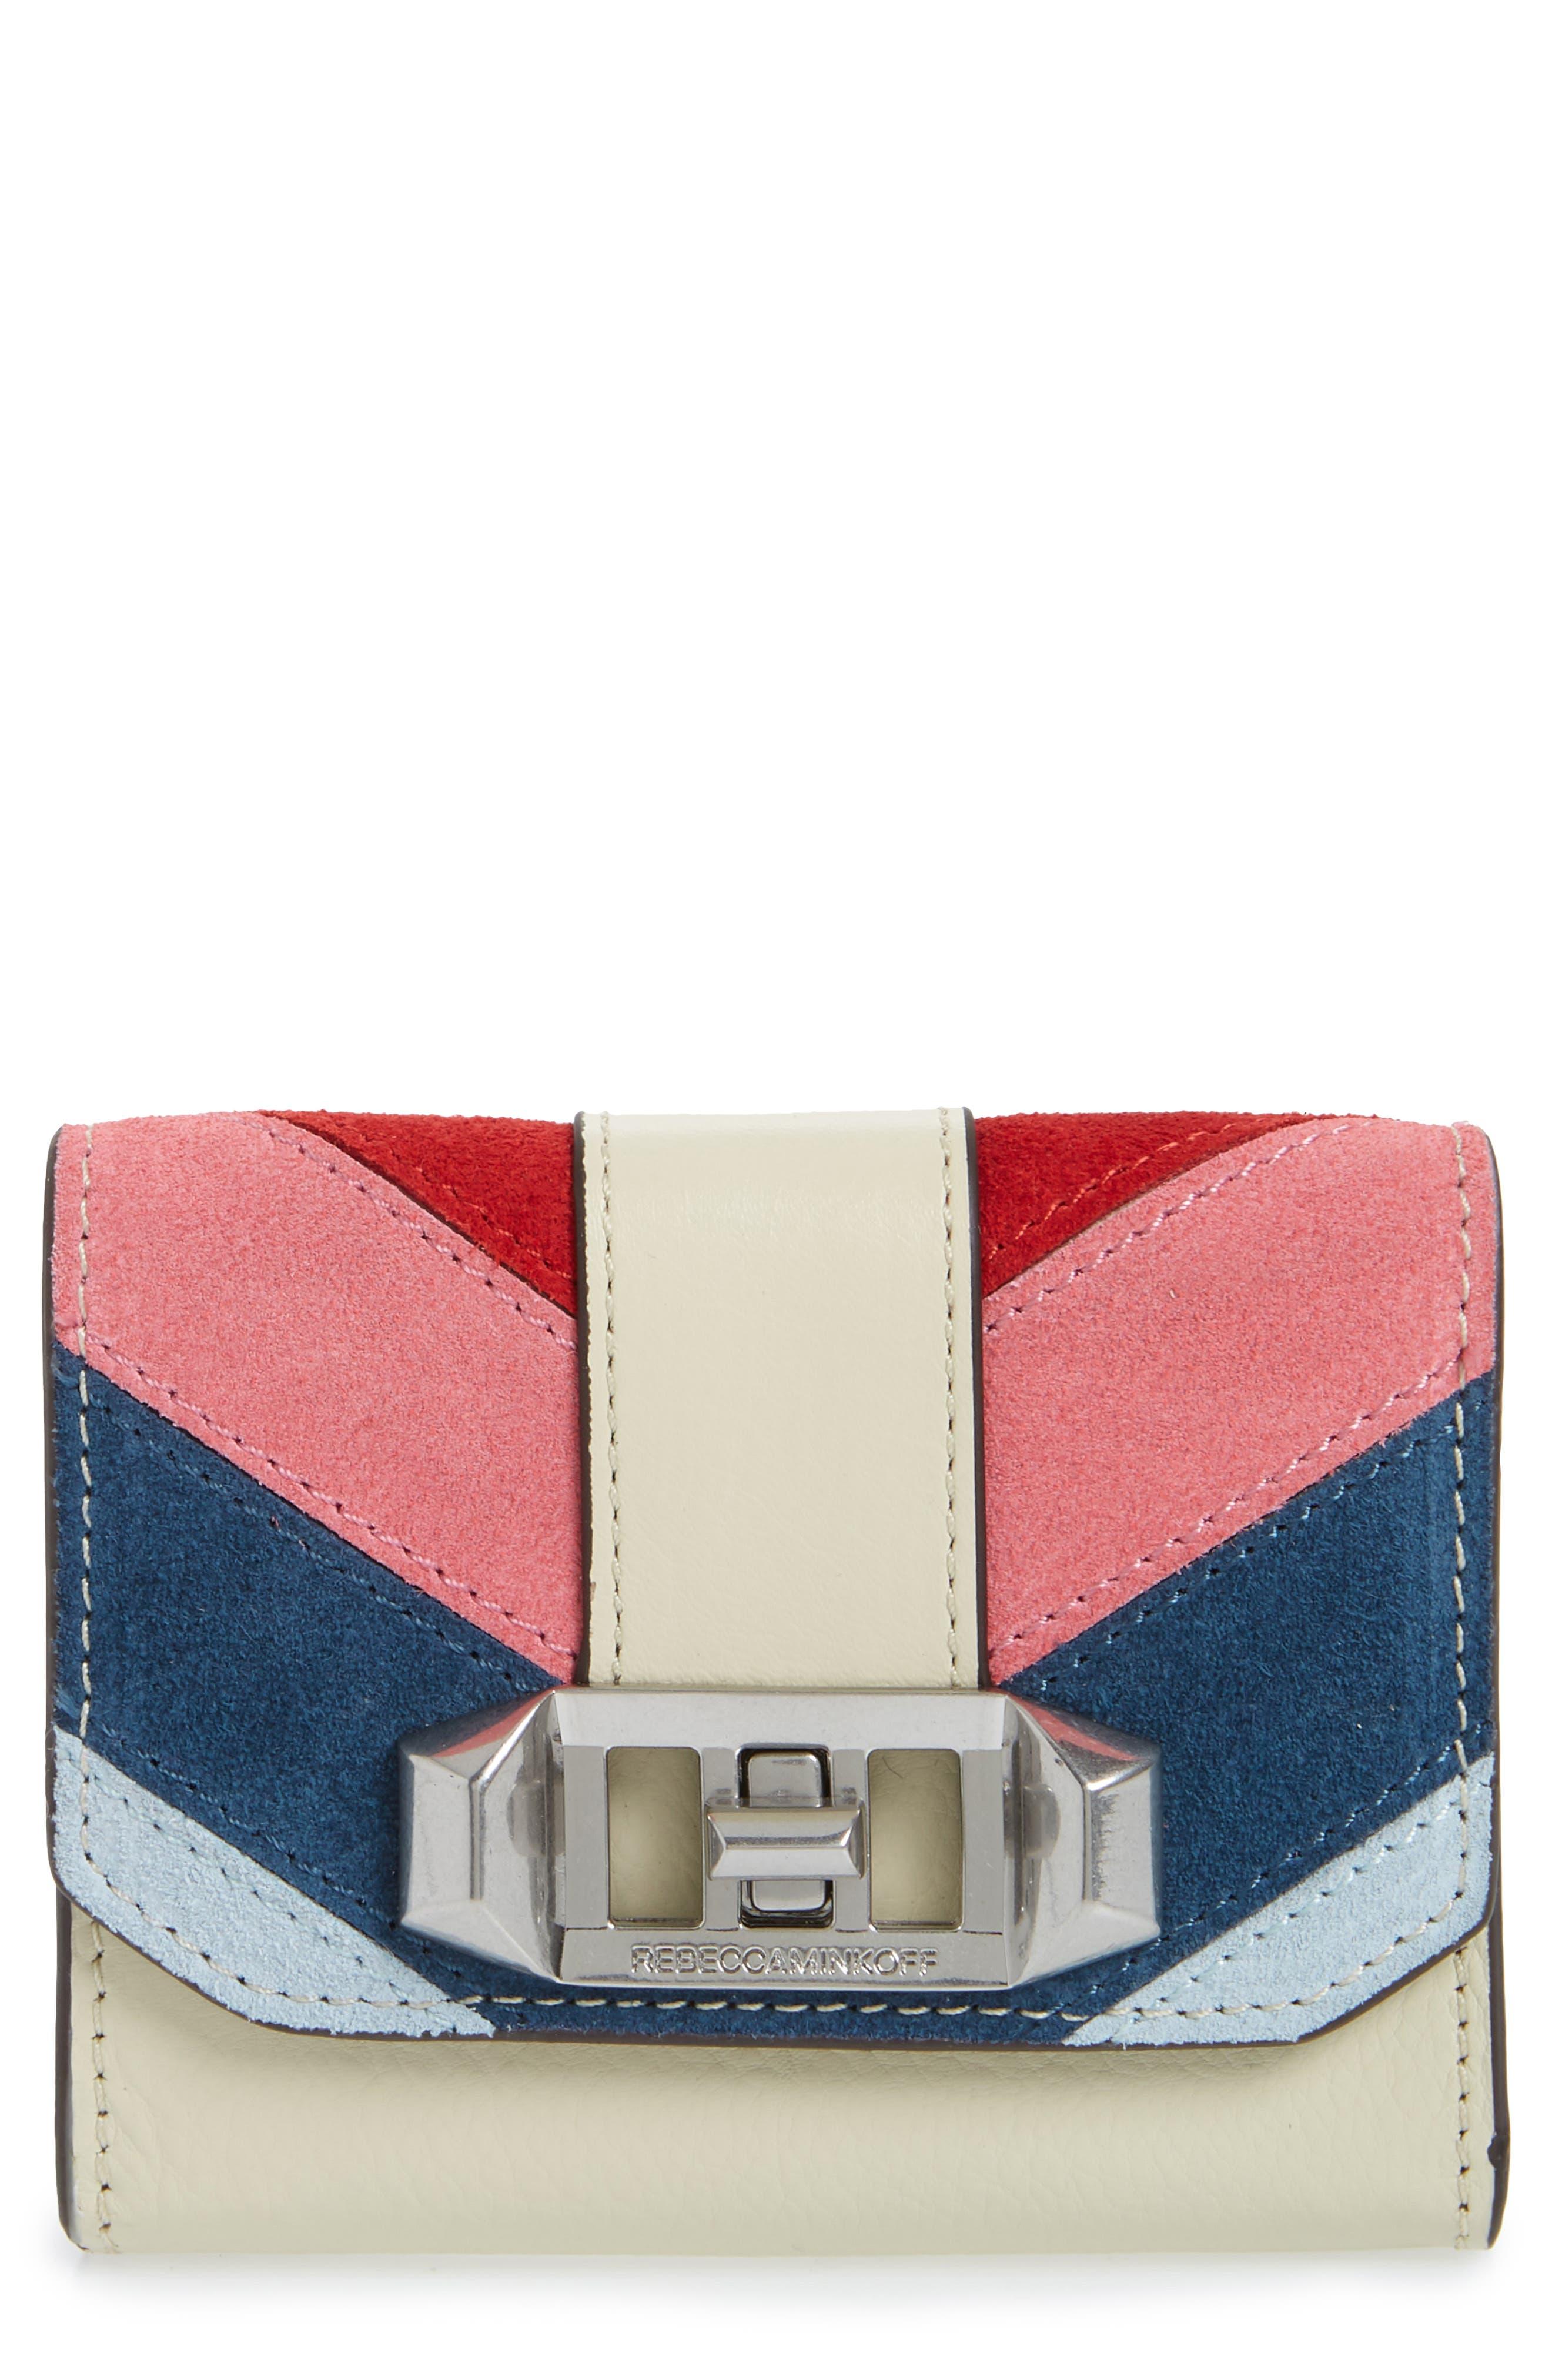 Rebecca Minkoff Love Lock Suede & Leather Wallet